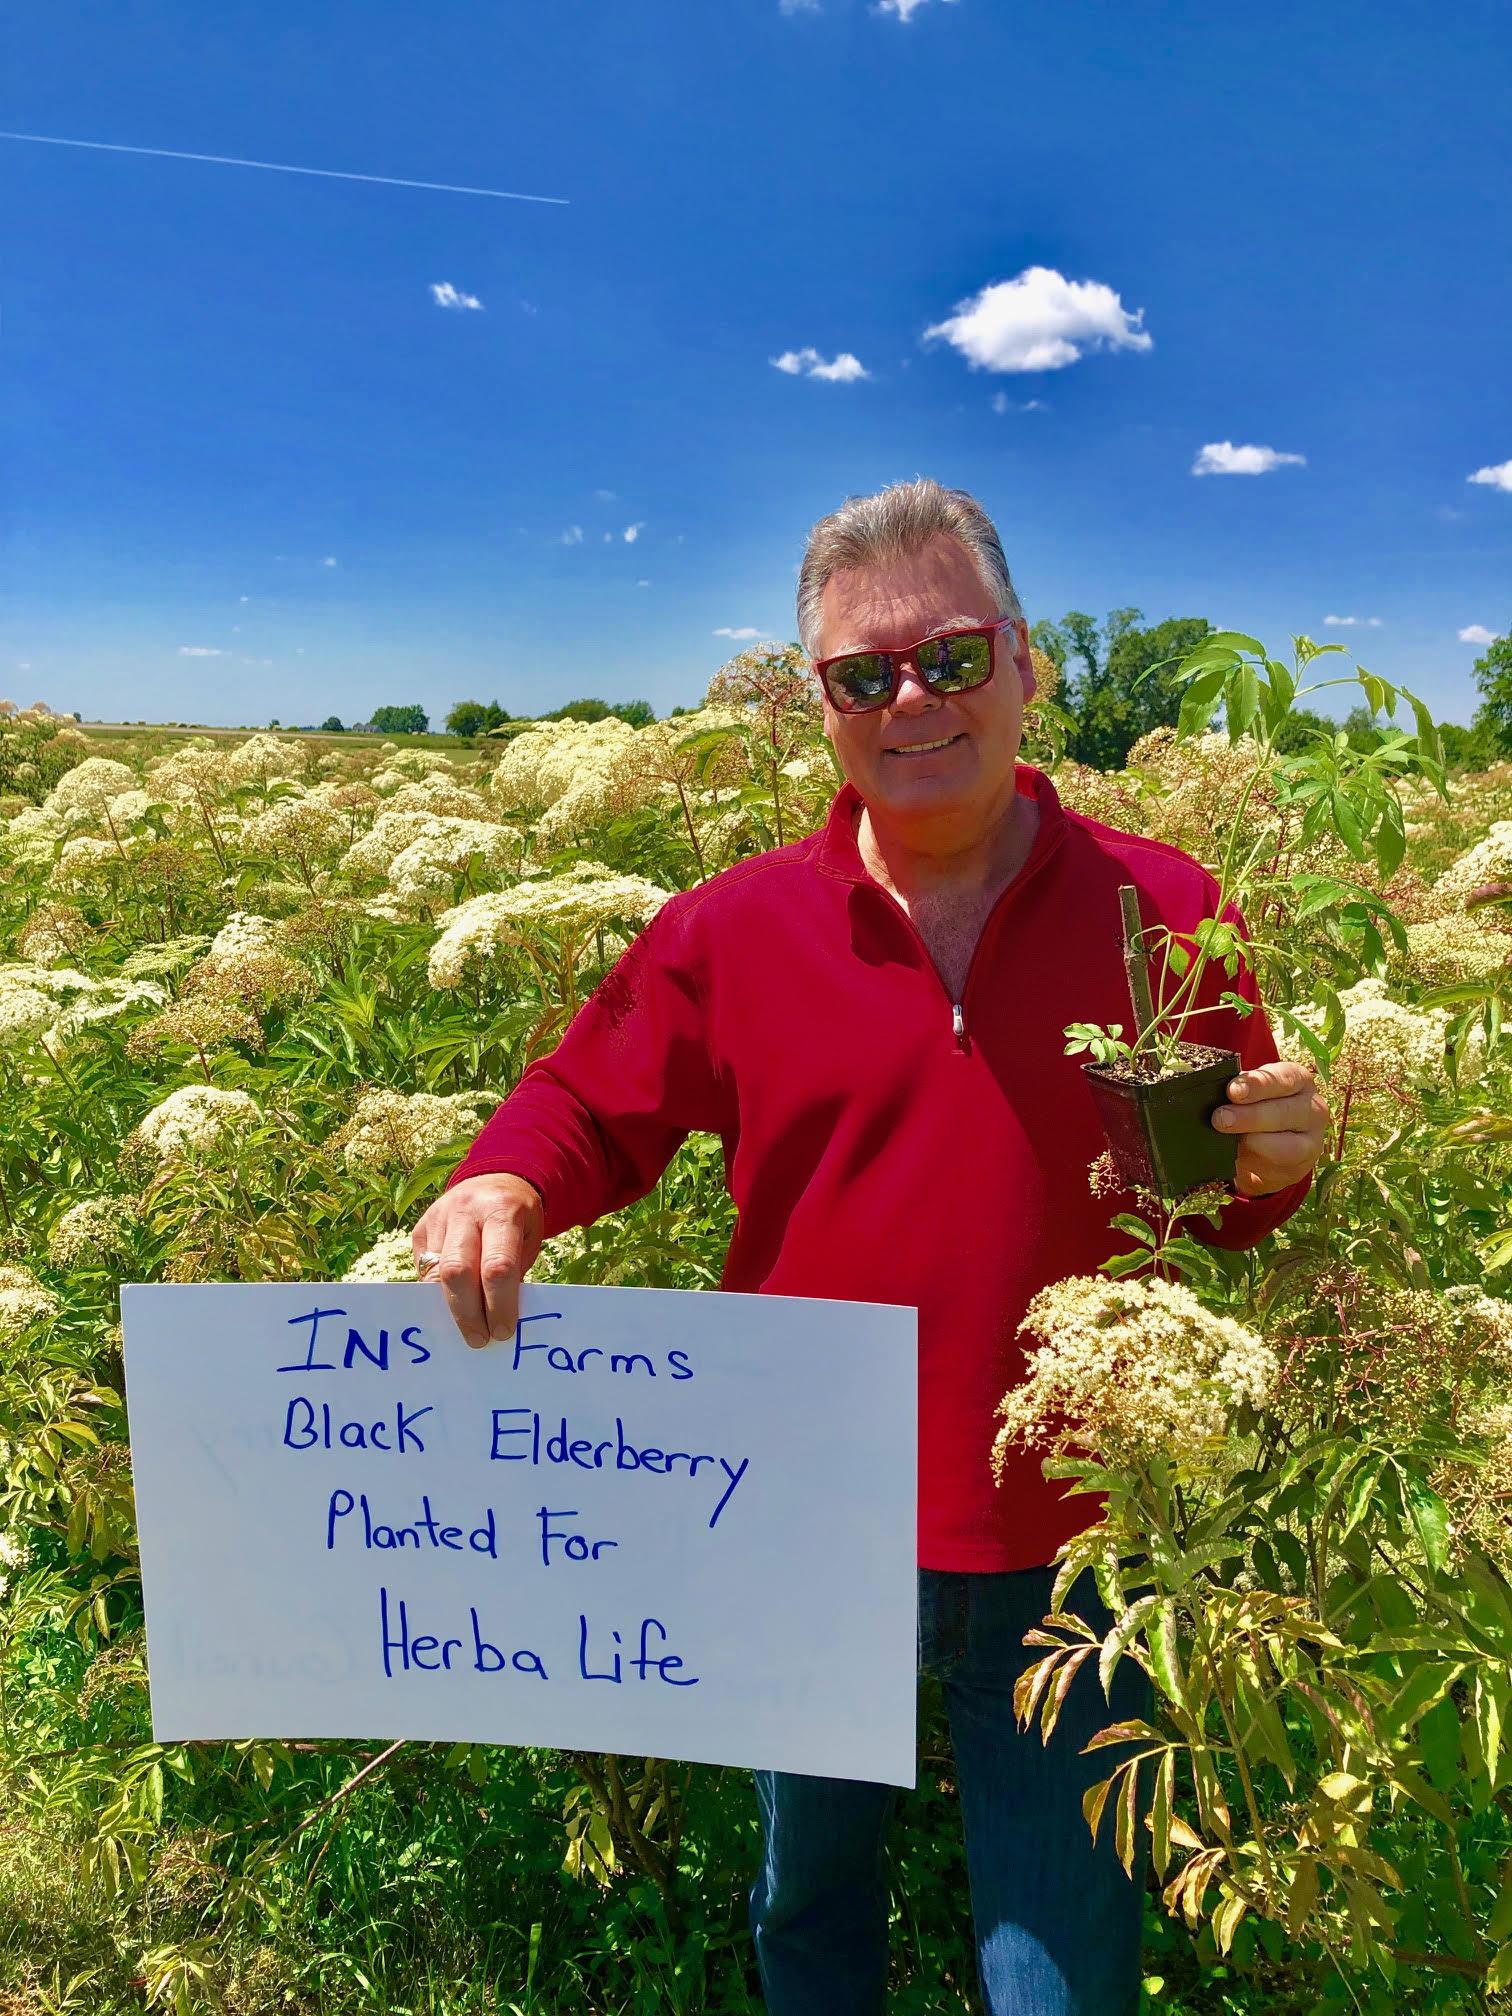 Plant-Elderberry-Herba-Life.jpg